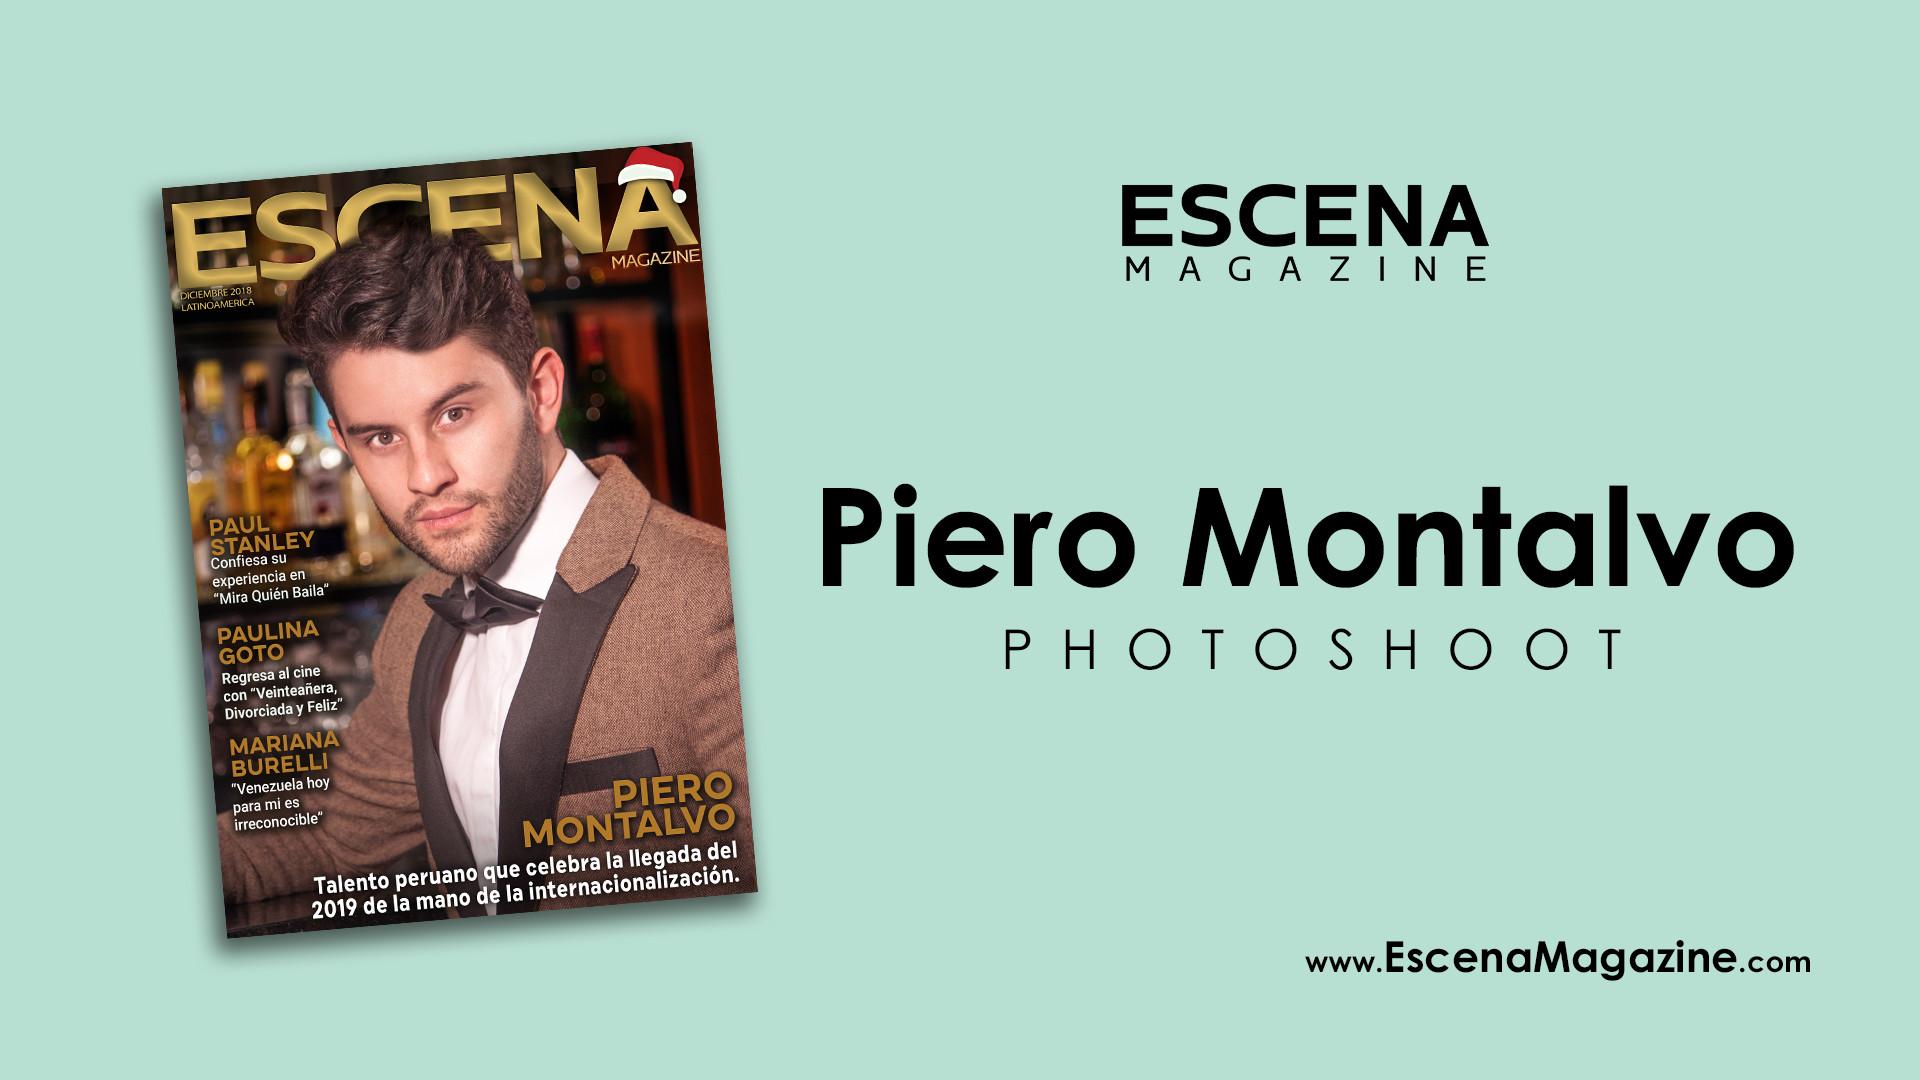 Editorial: Piero Montalvo para ESCENA magazine